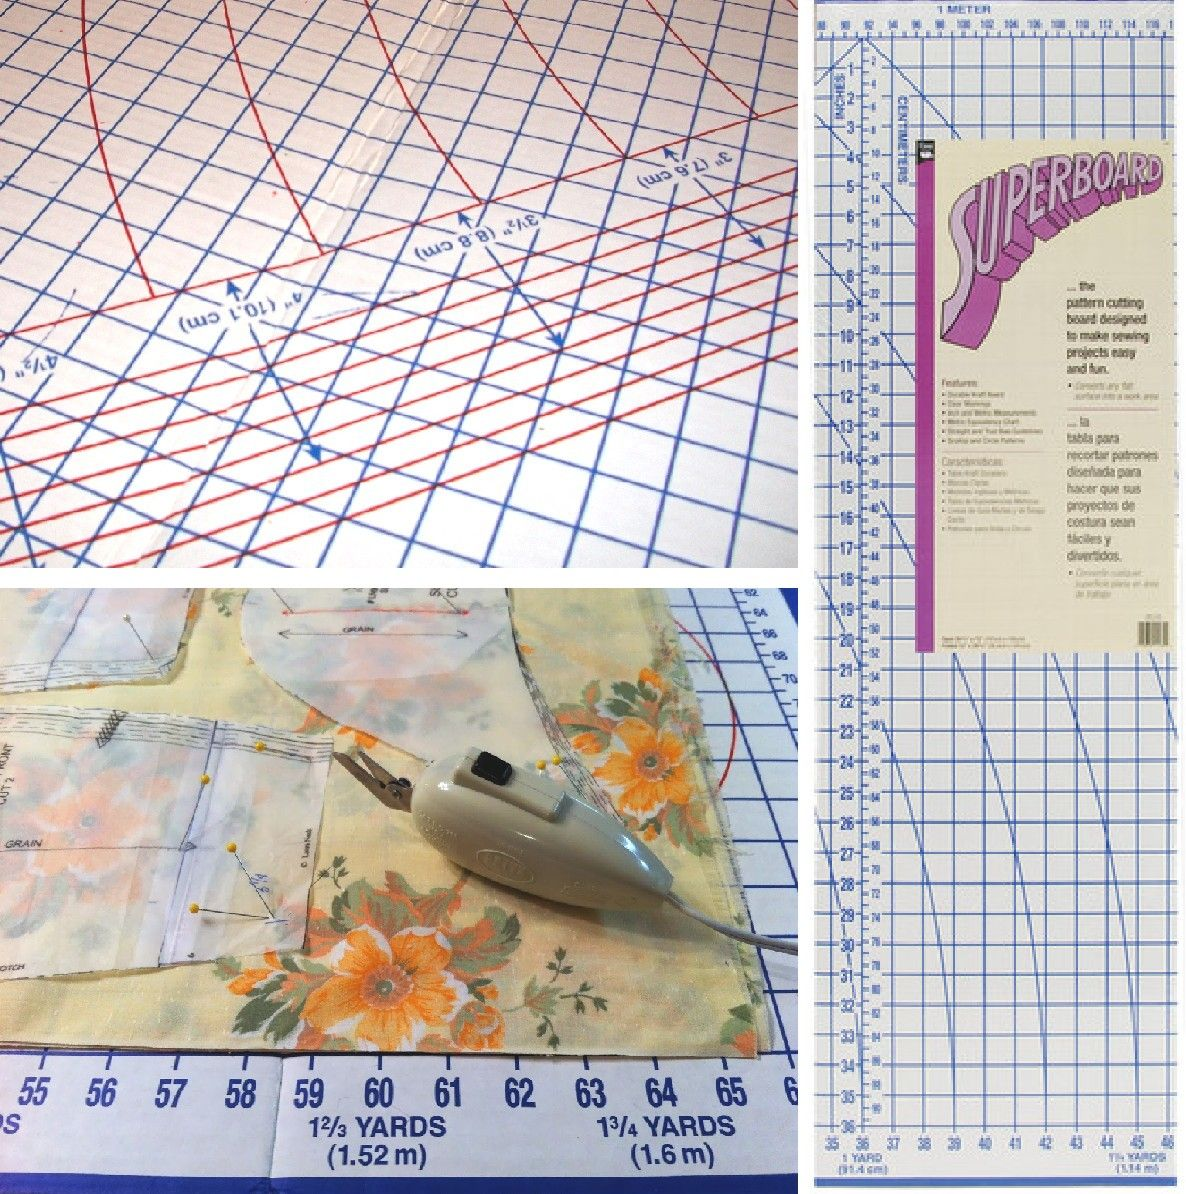 76901 Cutting board montage